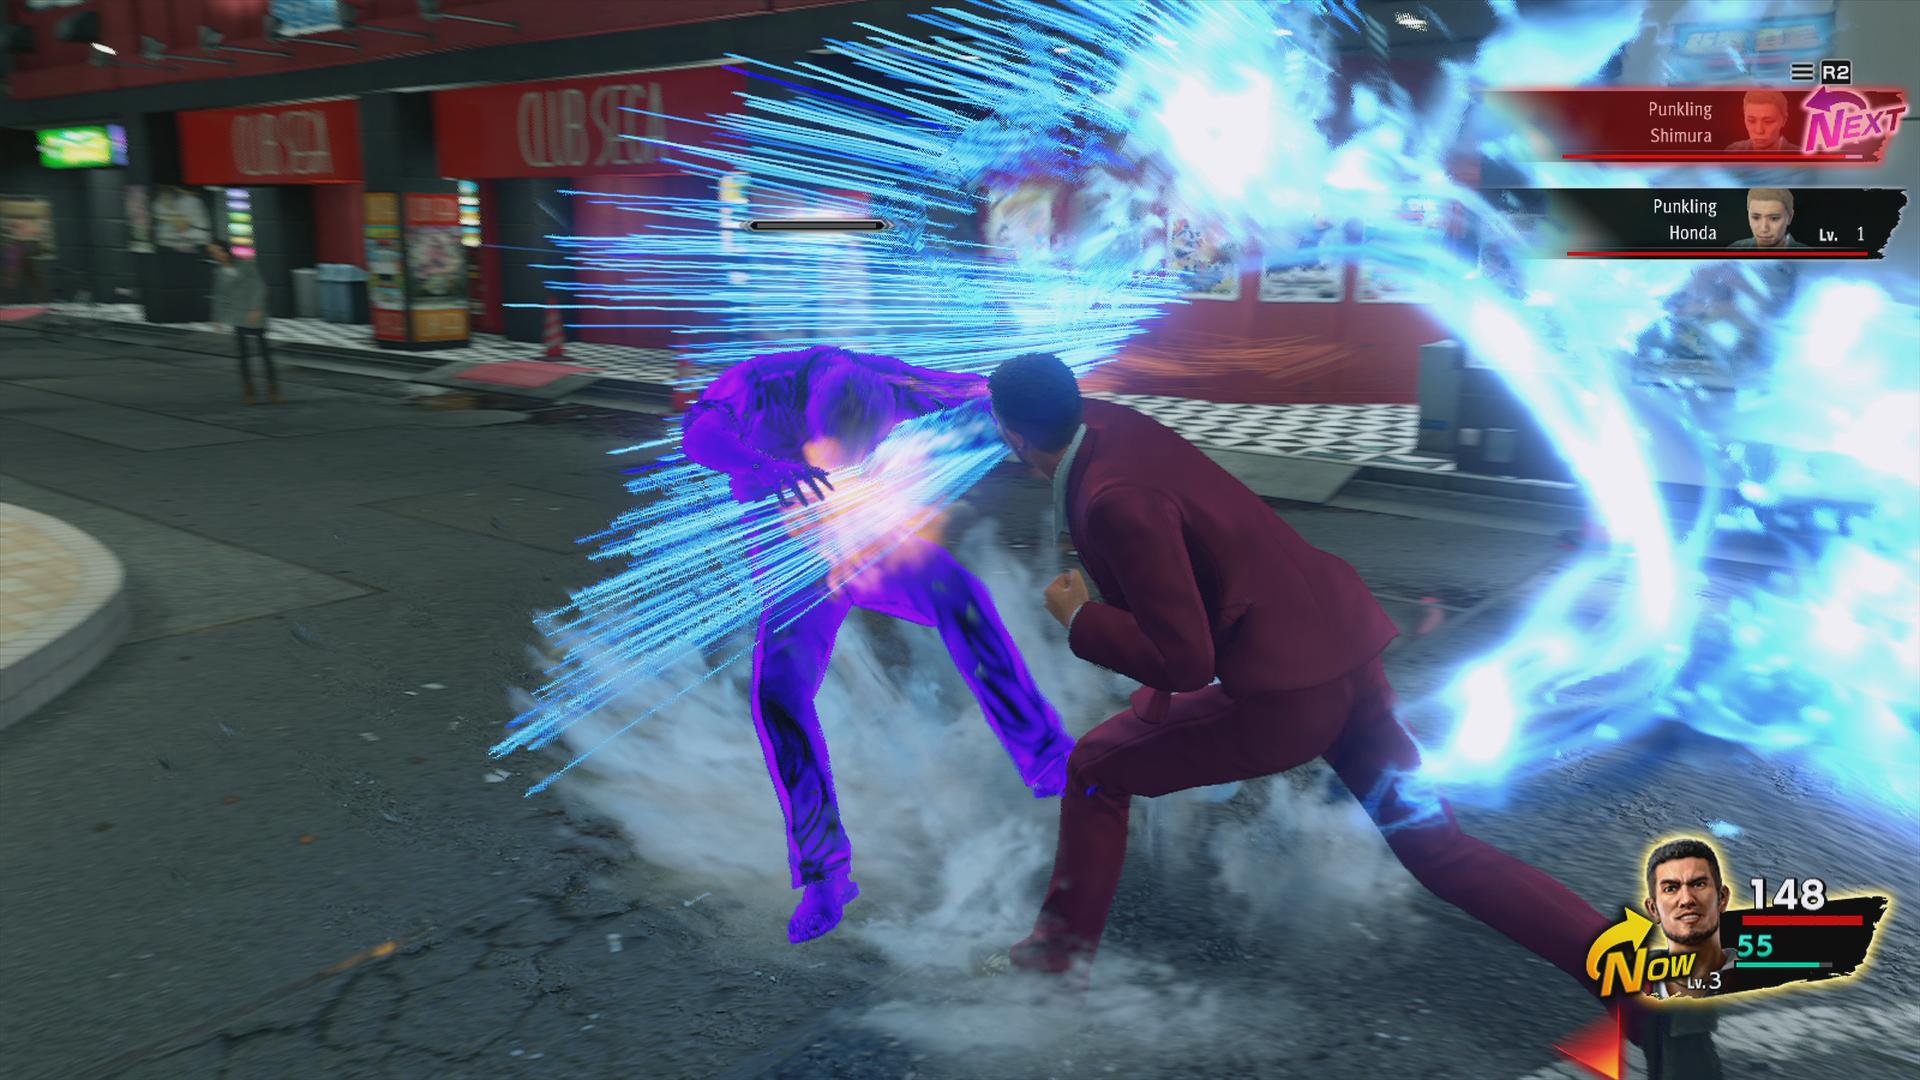 A battle scene from Yakuza: Like a Dragon, an RPG from SEGA.